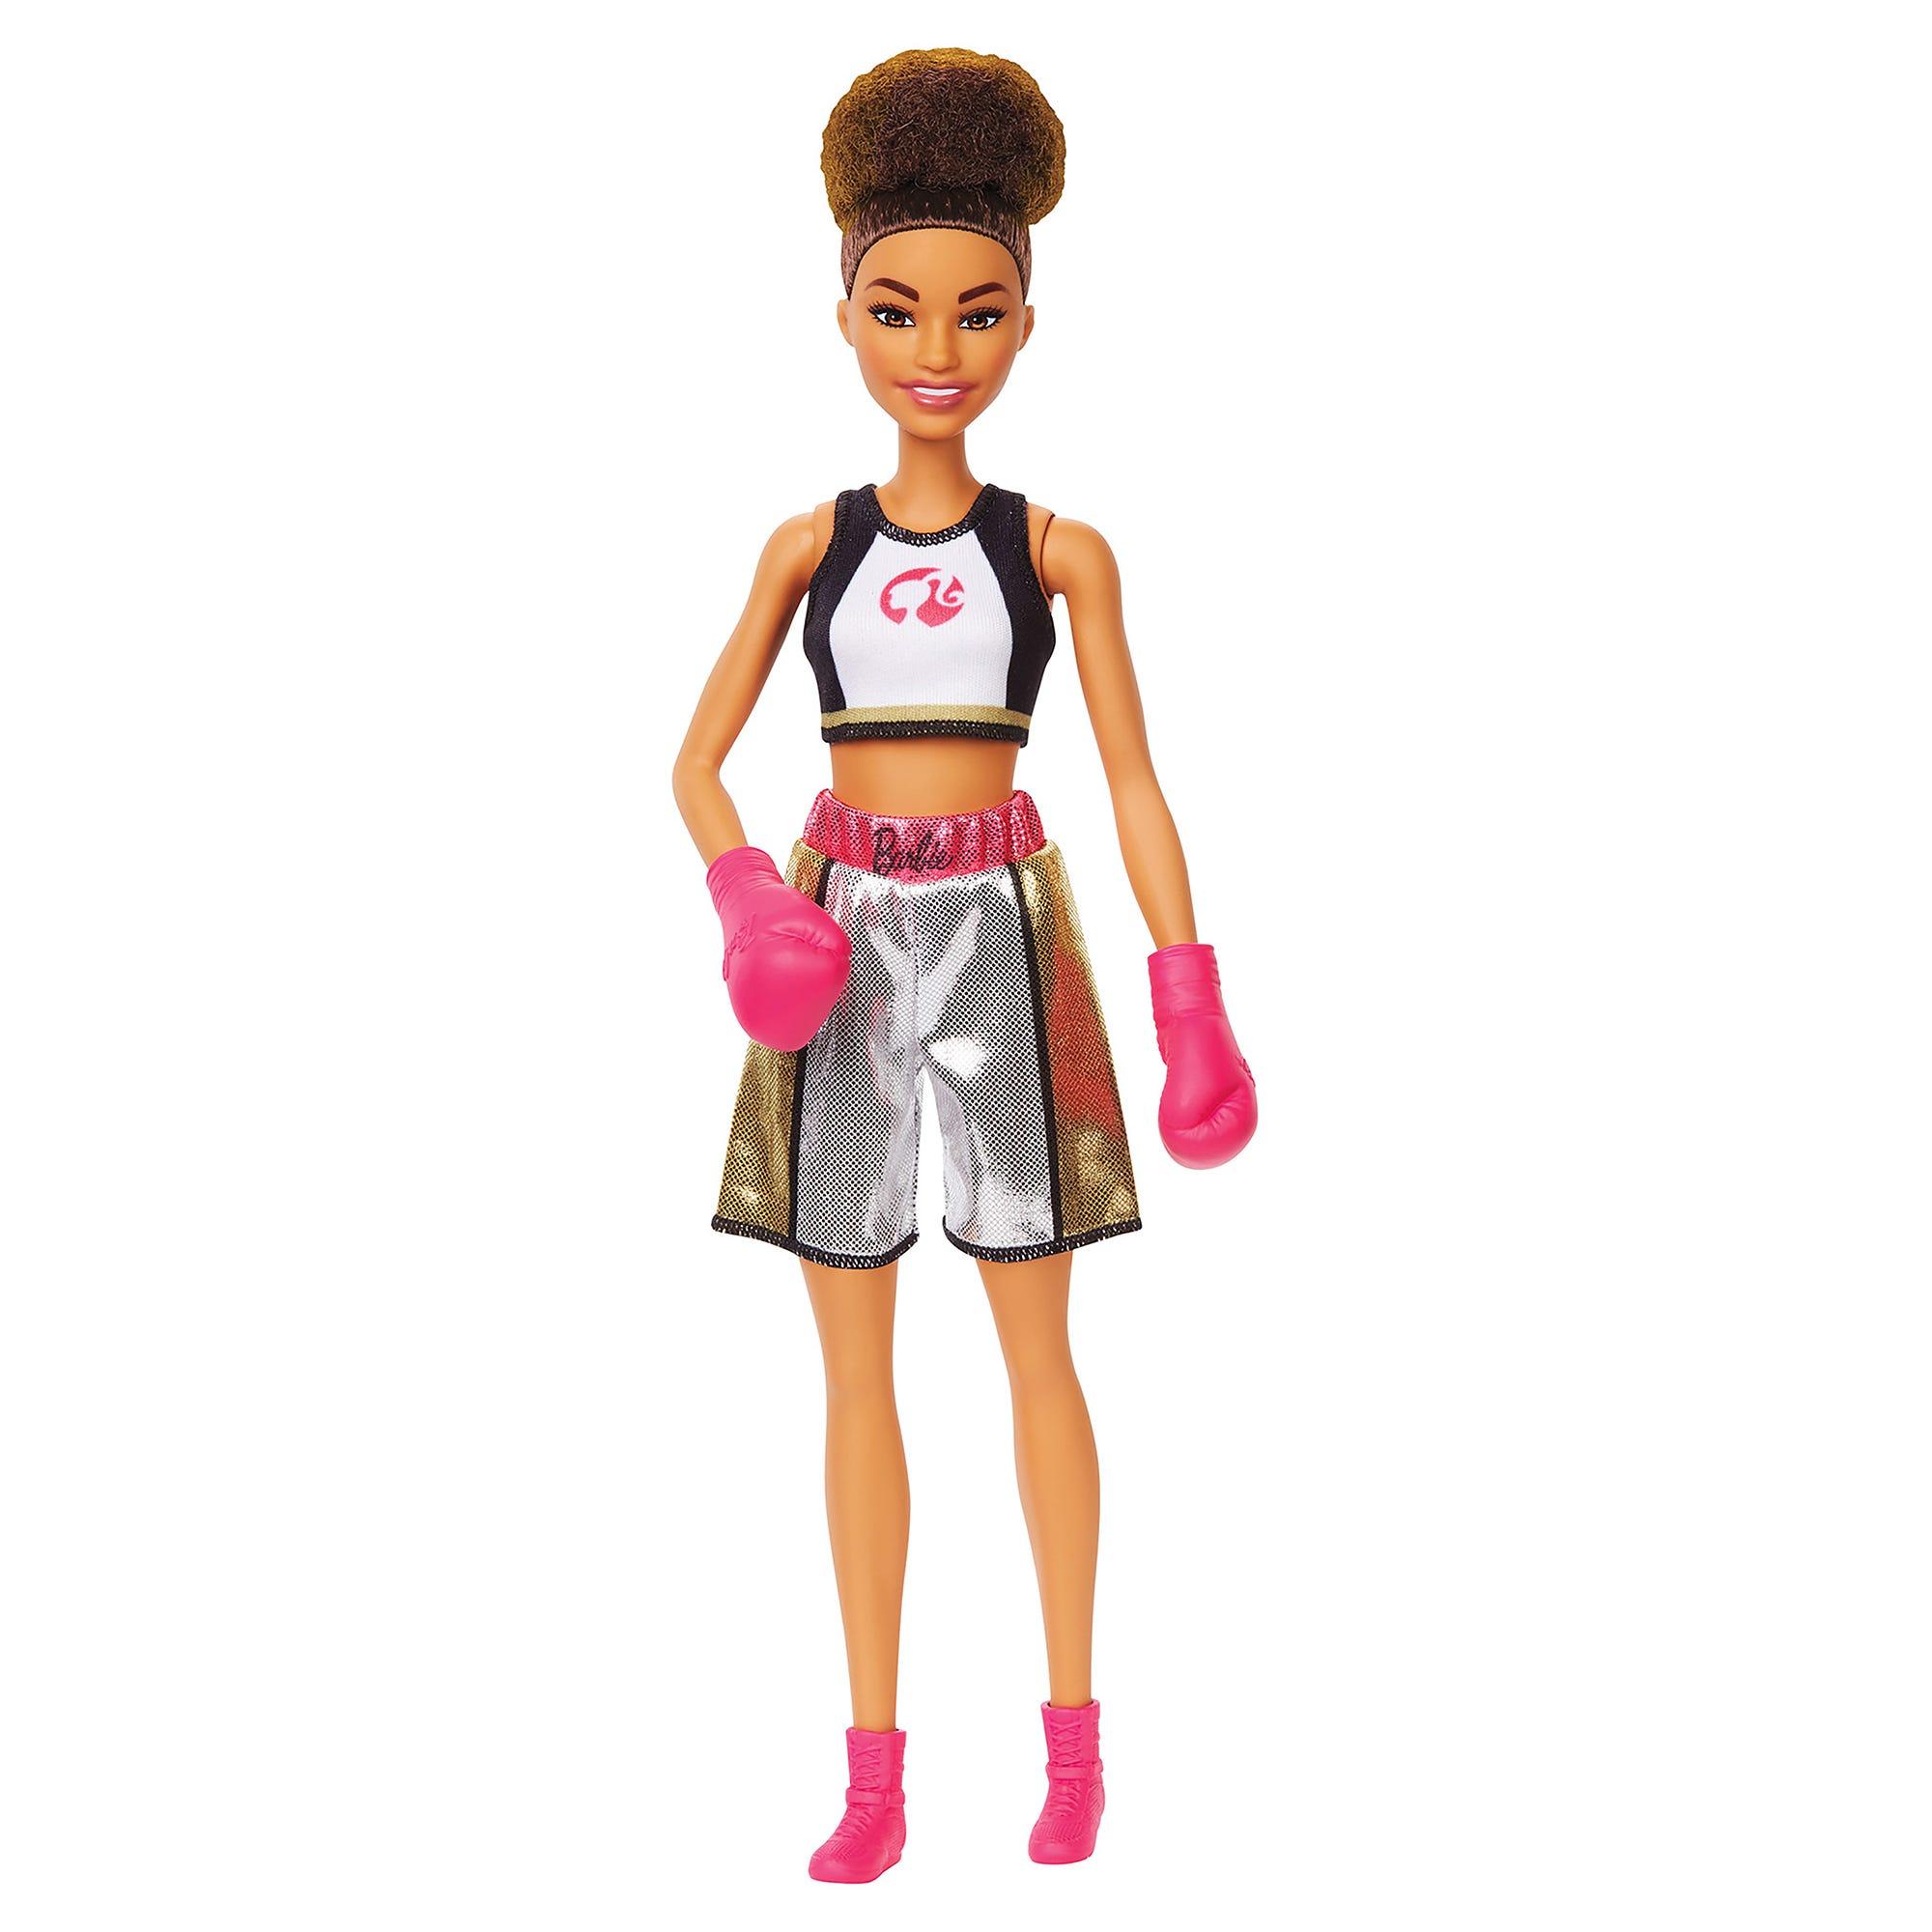 Barbie Boxer Doll